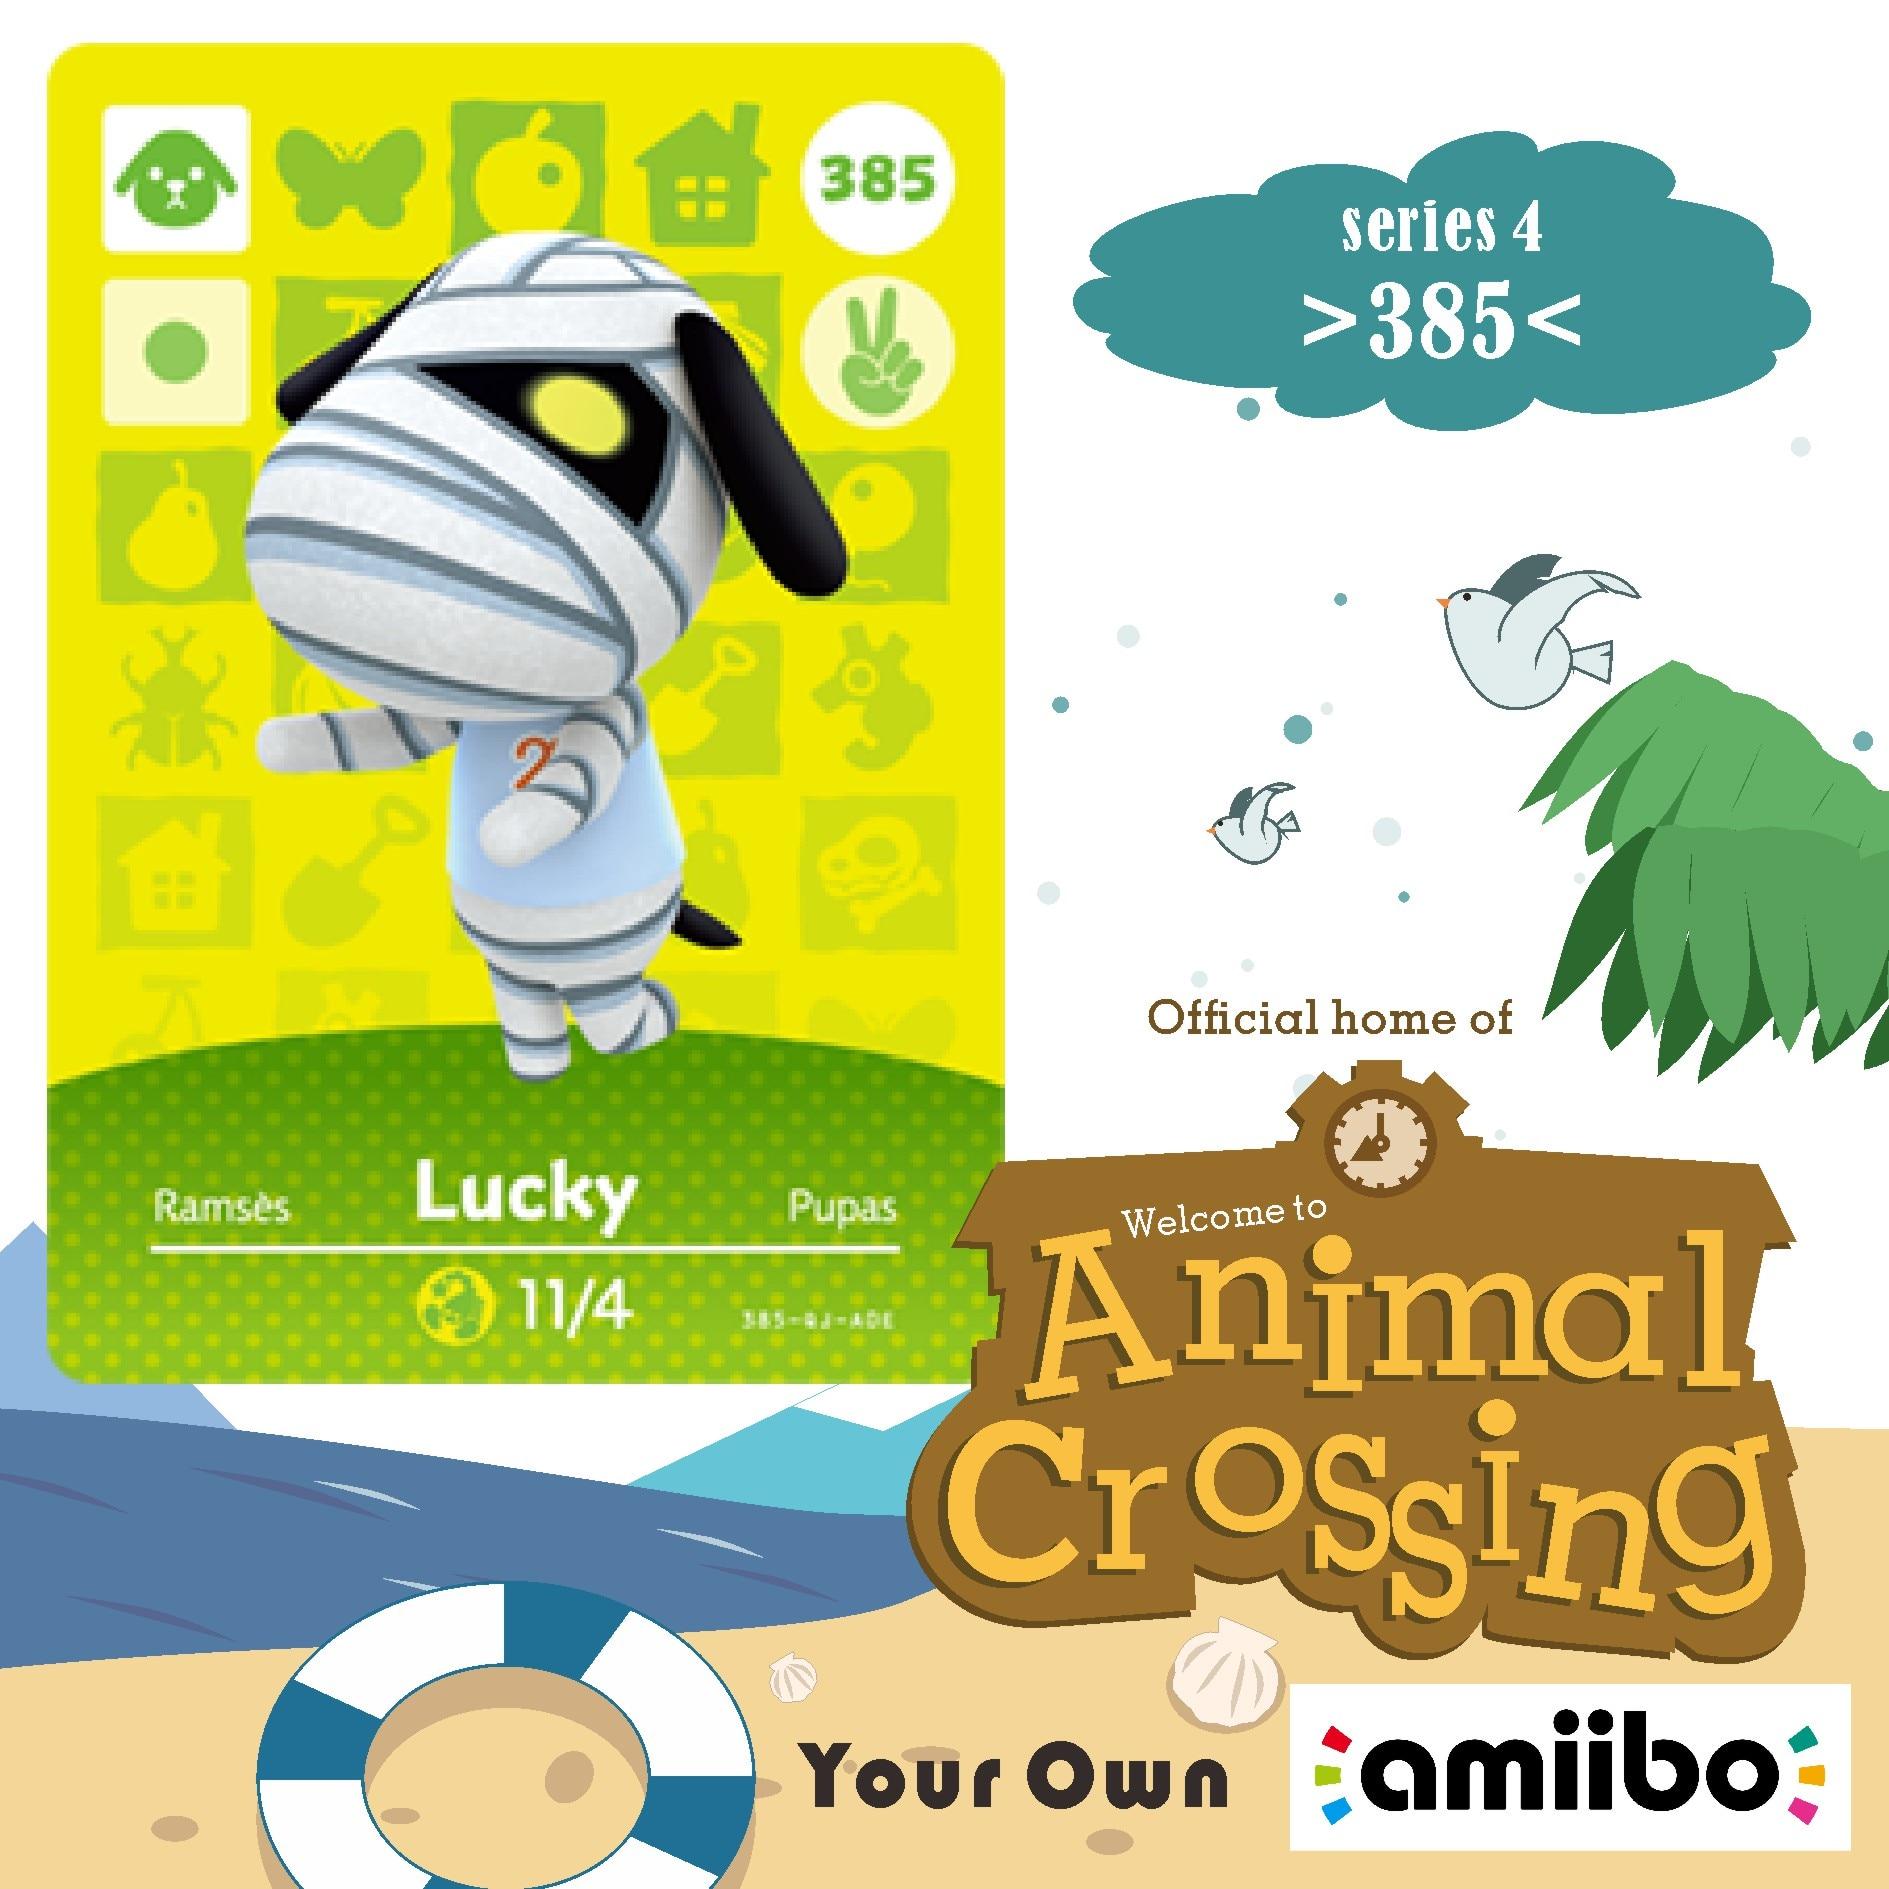 Amiibo Animal Crossing Lucky Cards Animal Crossing Switch Rv Welcome Amiibo Villager New Horizons Amiibo Card Gift Cross Card